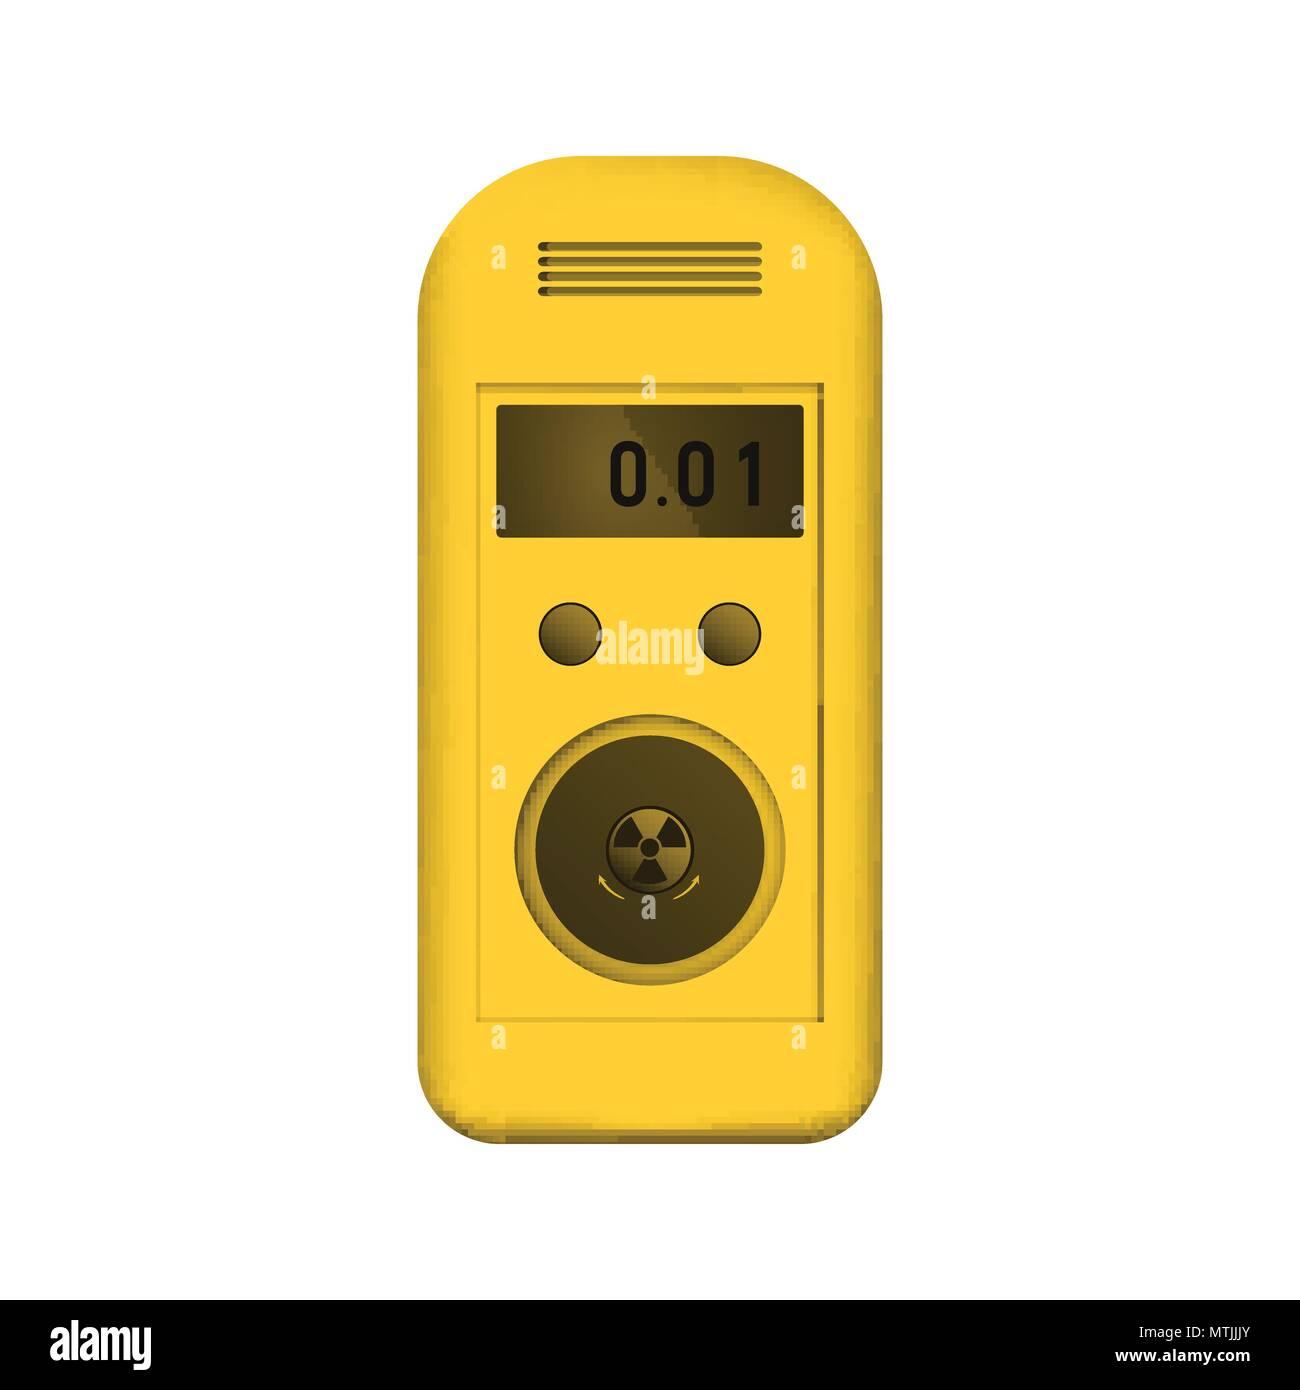 Radiation dosimeter - Stock Vector